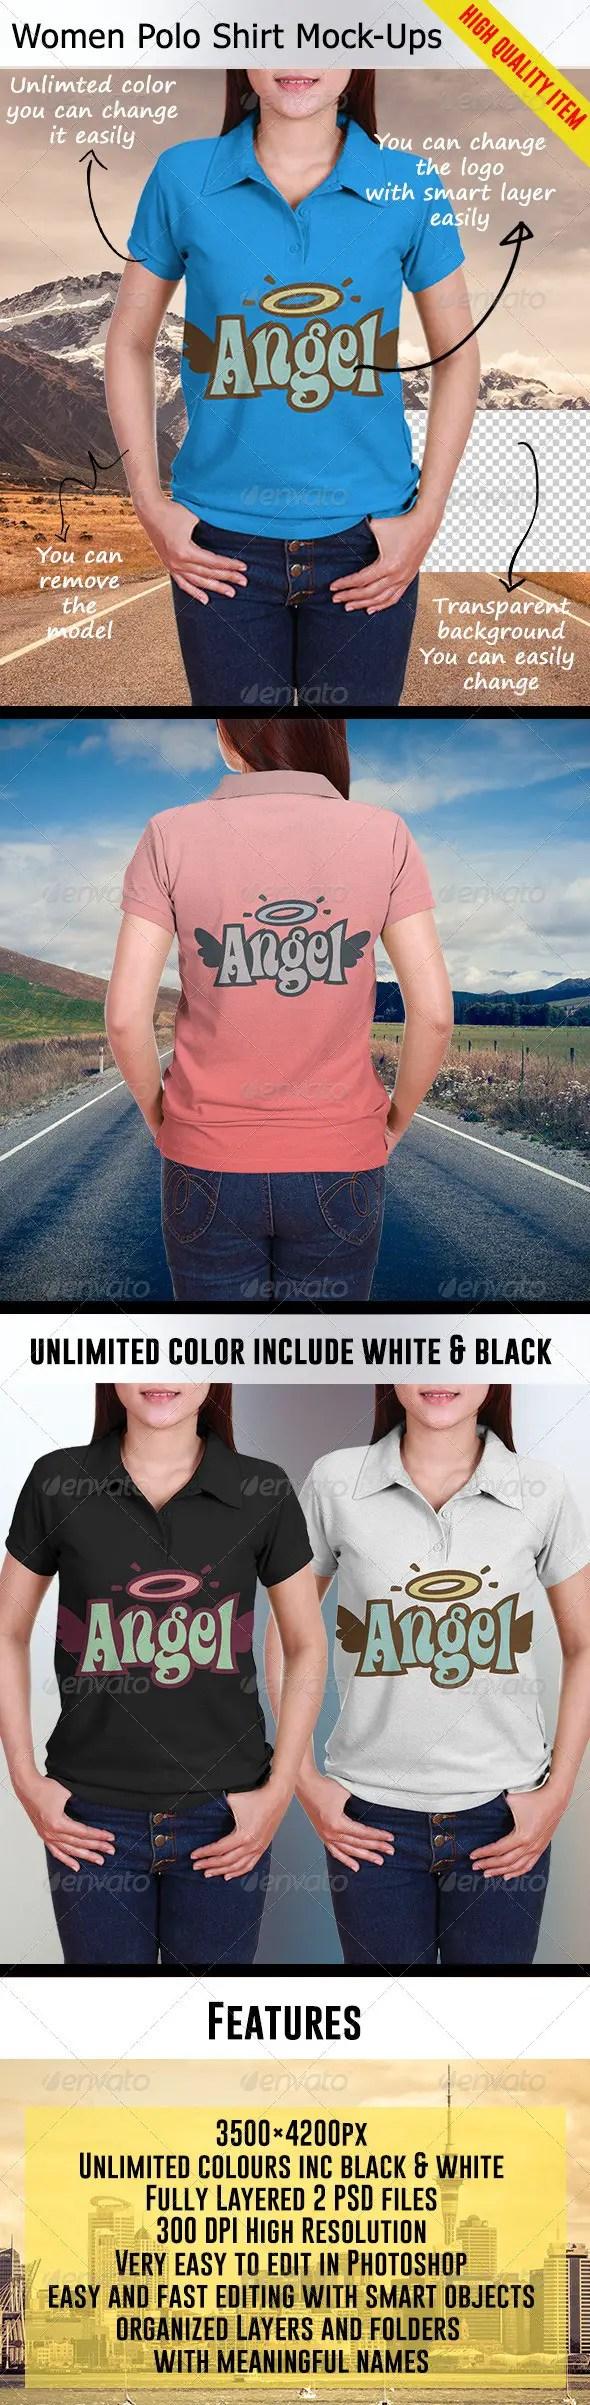 Women Polo Shirt Mockups